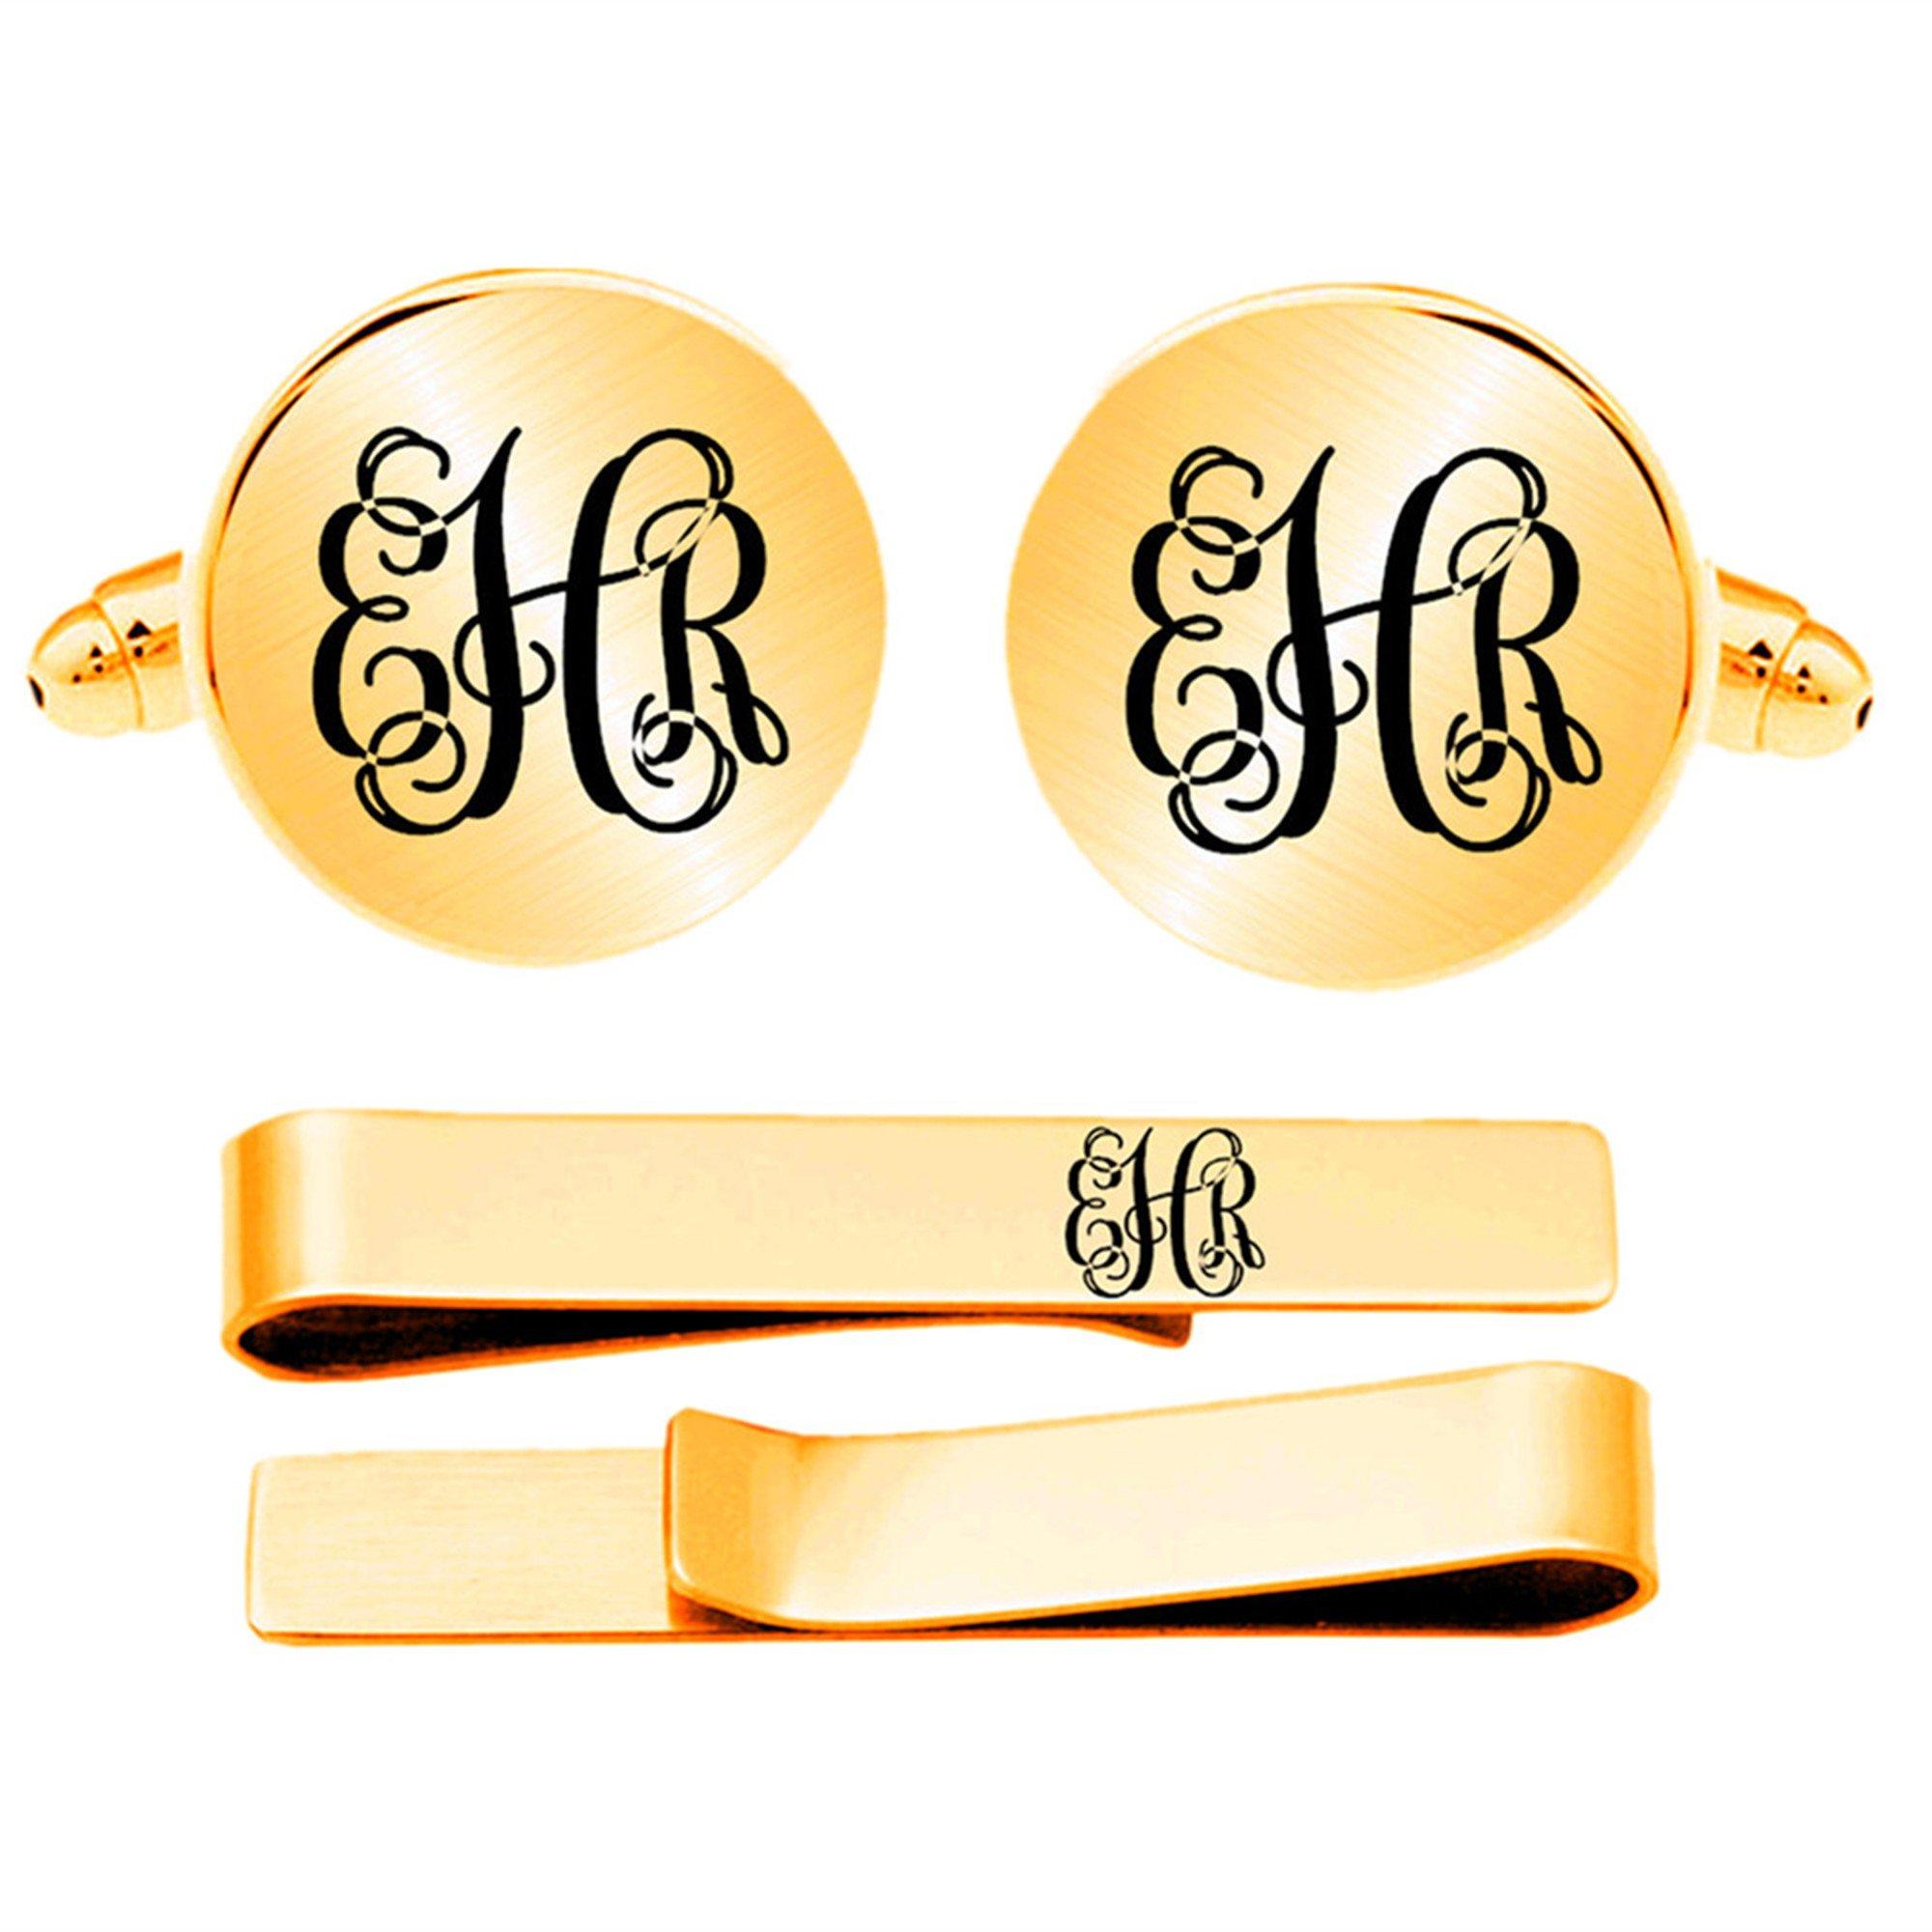 Kooer Custom Personalized Monogram Engraved Cuff Links Handmade Engrave Wedding Initials Cufflinks Jewelry (Gold plated round cufflinks tie clip set)